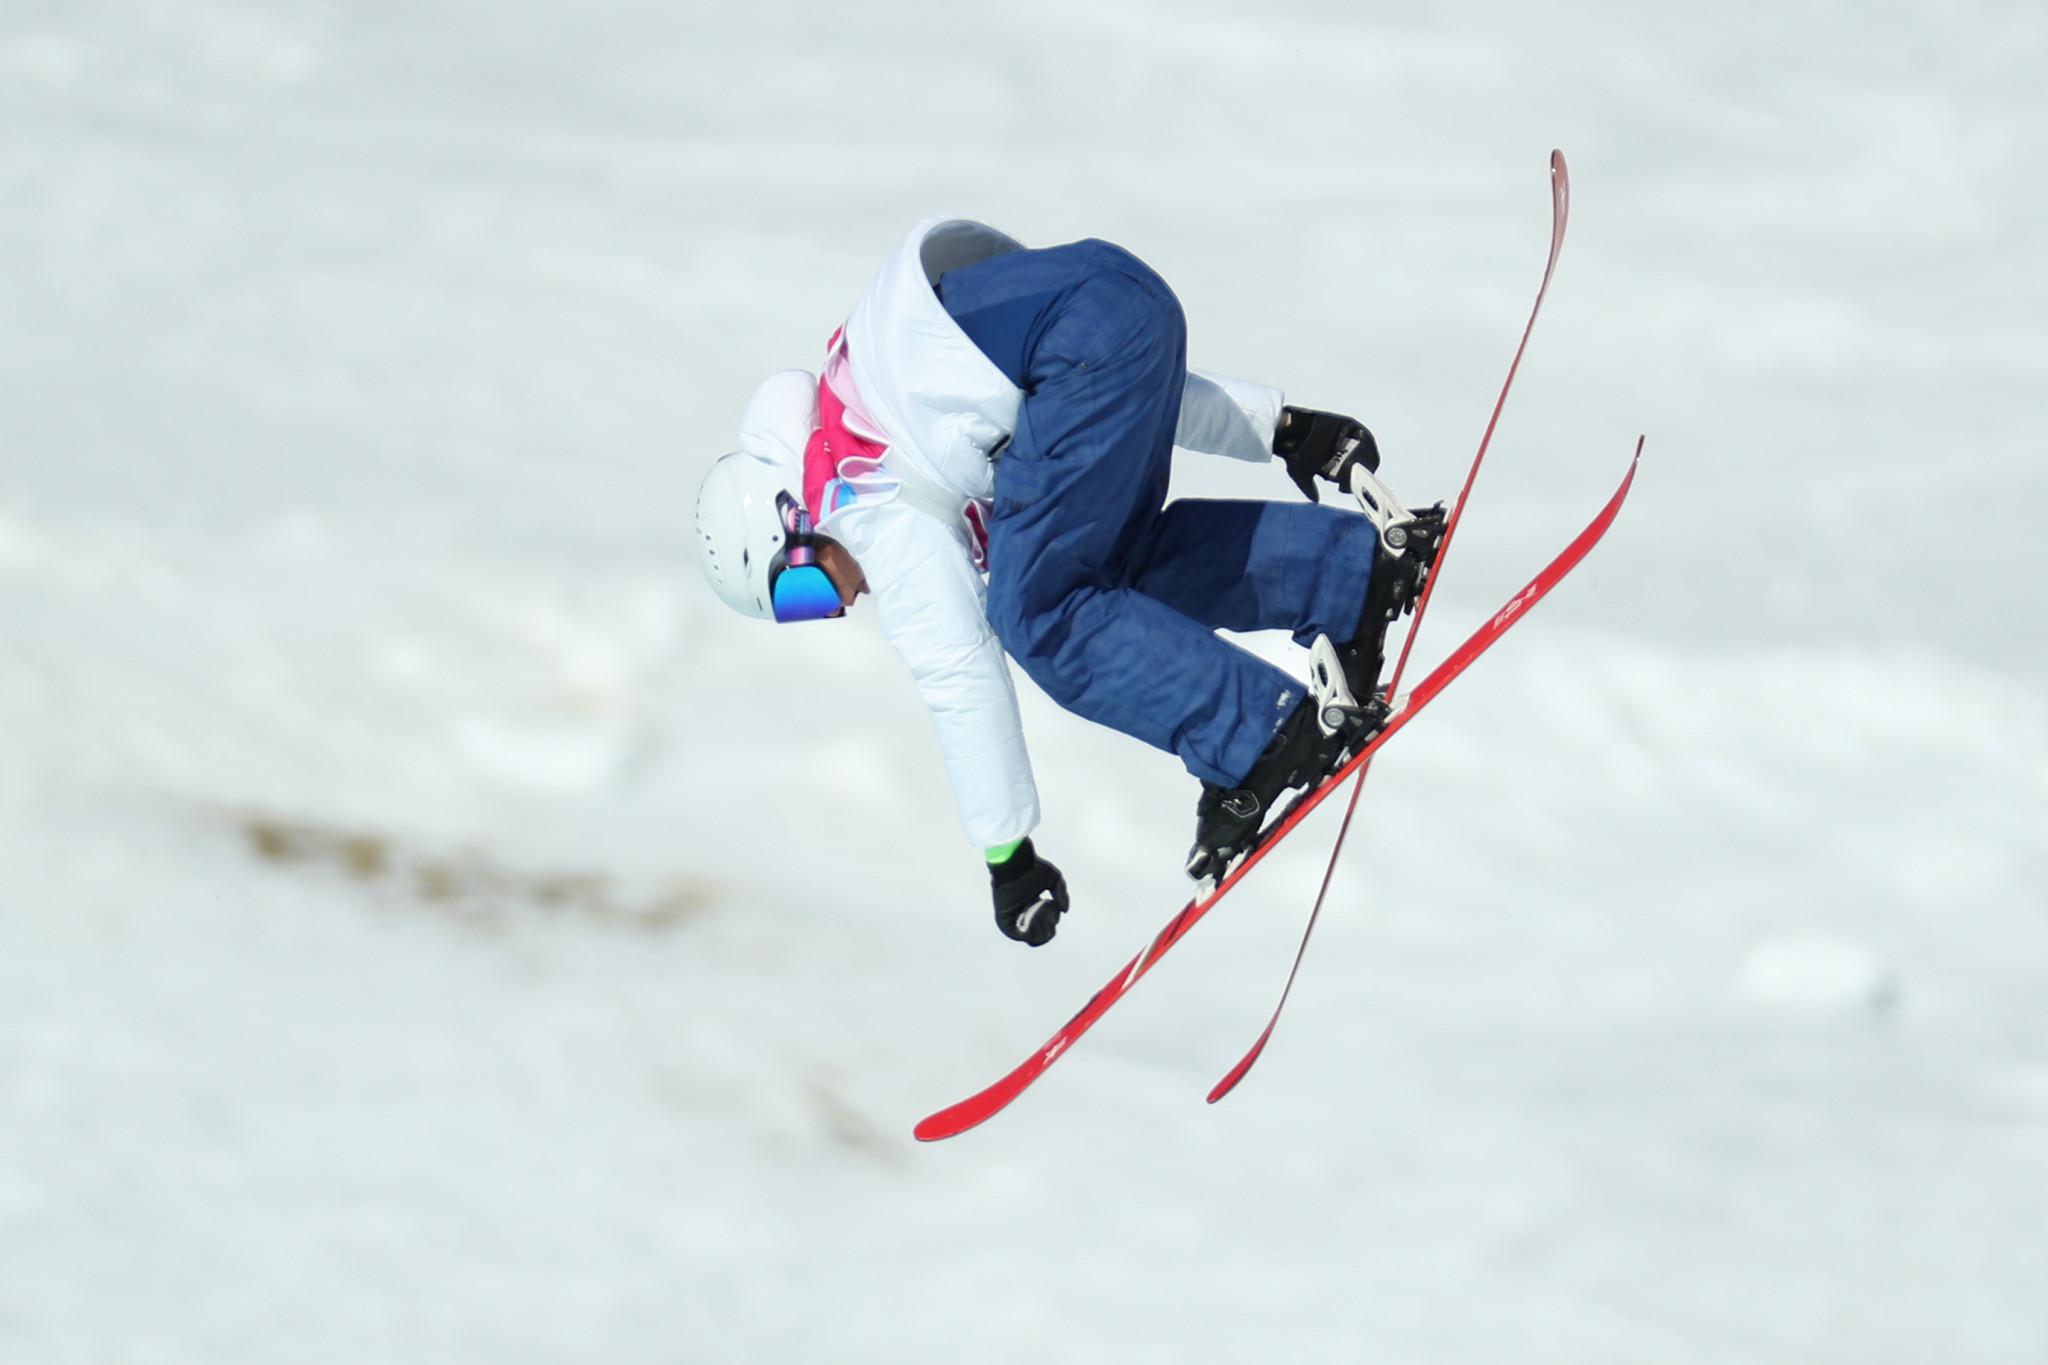 Orlova and Švancer strike gold again at Freestyle Ski Junior World Championships